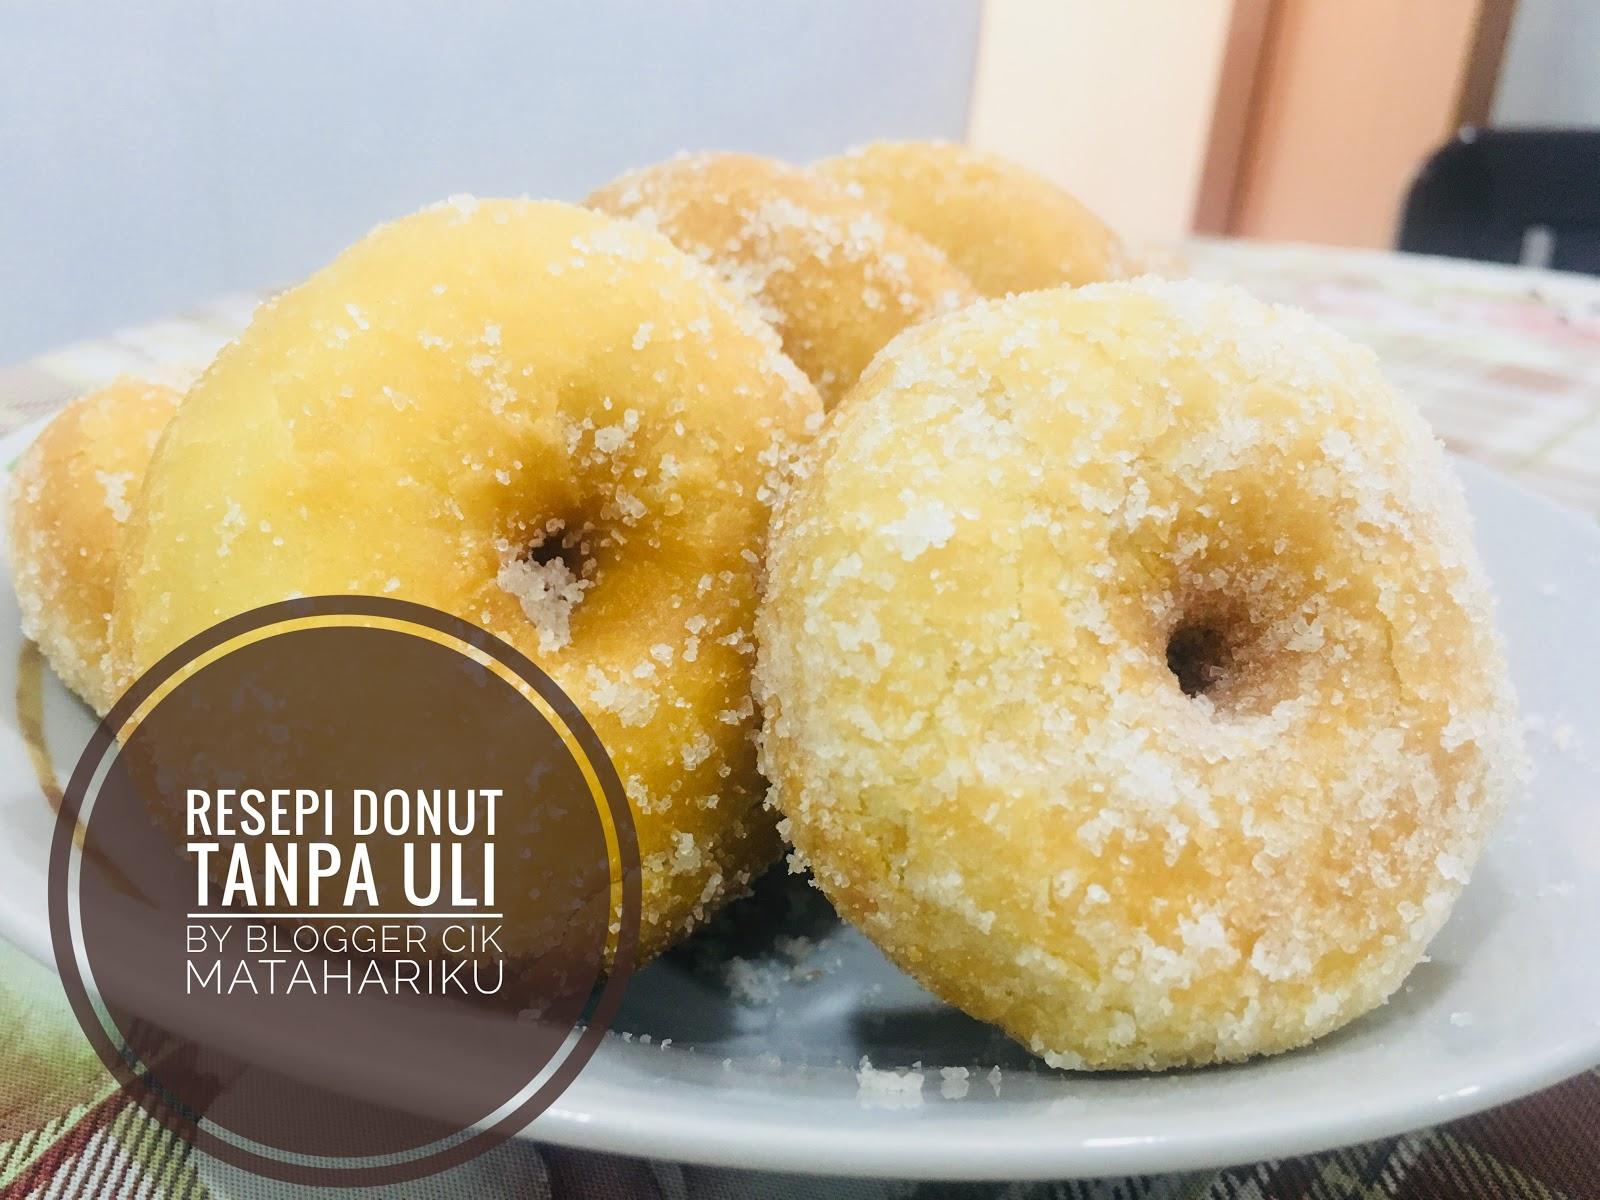 Resepi Buat Donut Gebu Tanpa Uli Blog Cik Matahariku